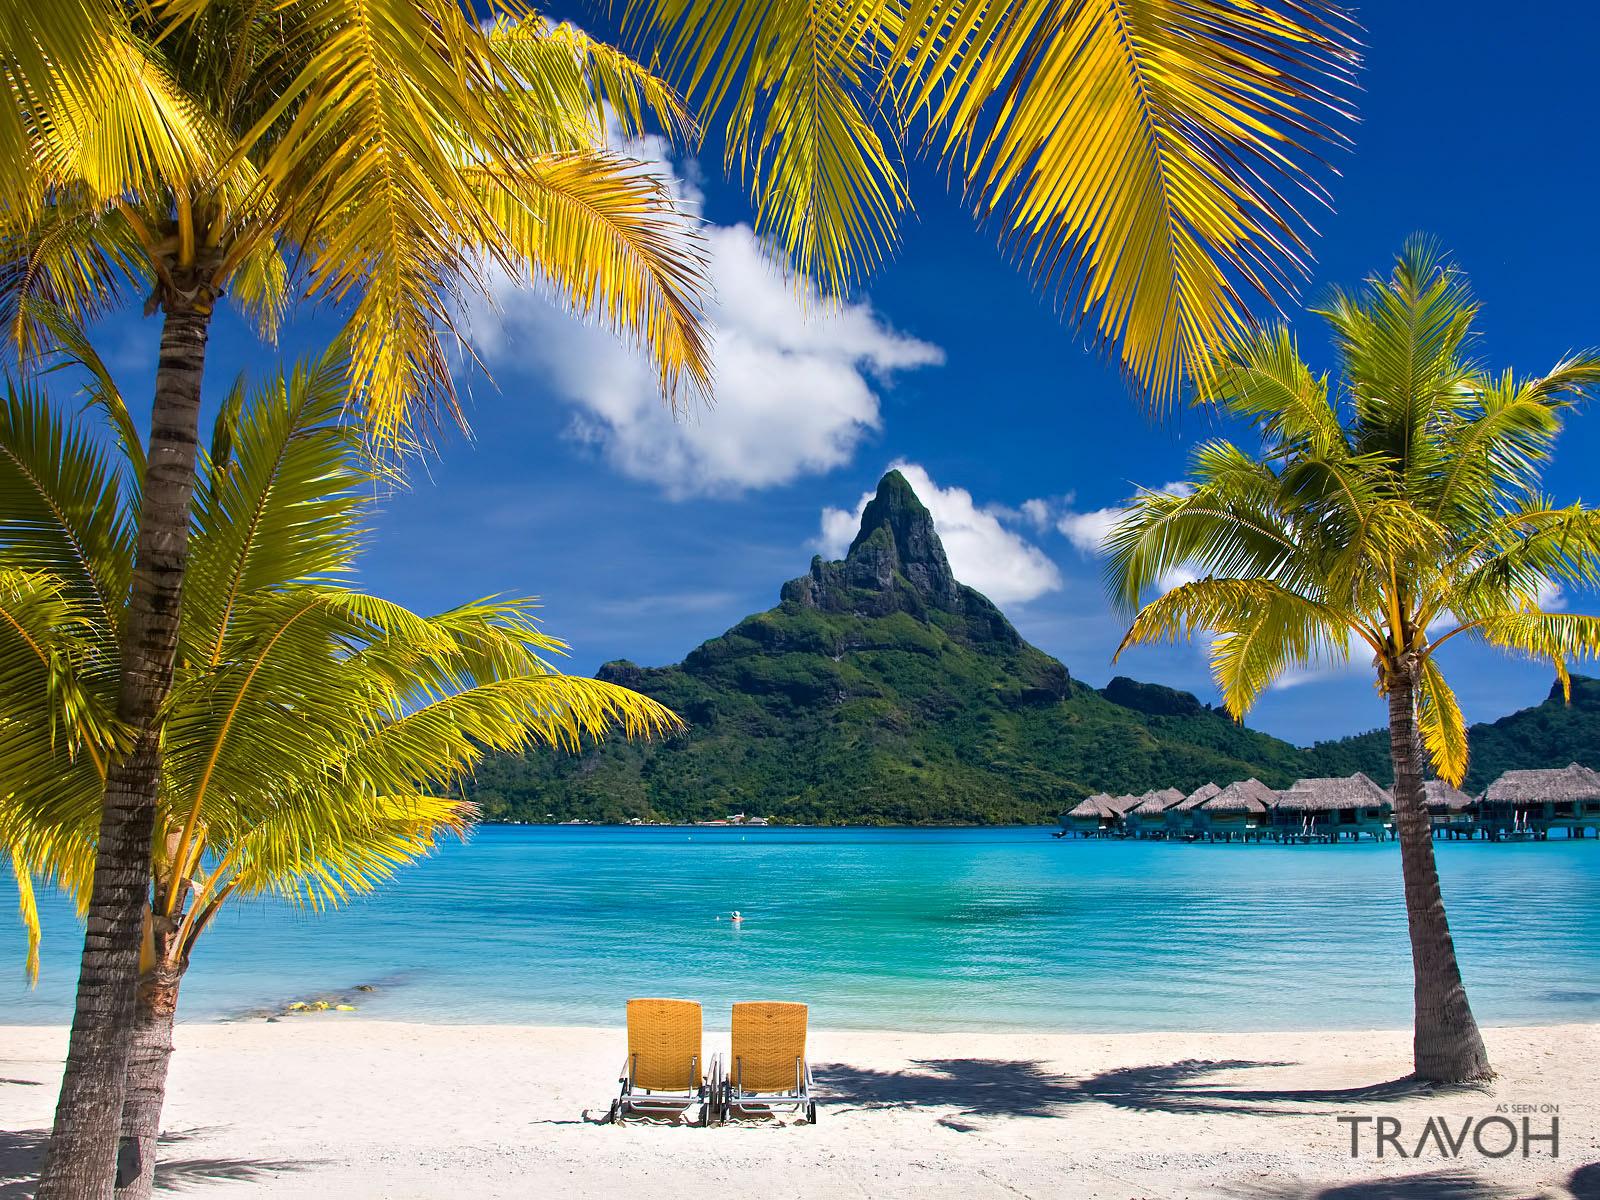 Bora Bora, French Polynesia – Five Romantic Hideaways for a Luxury Destination Getaway